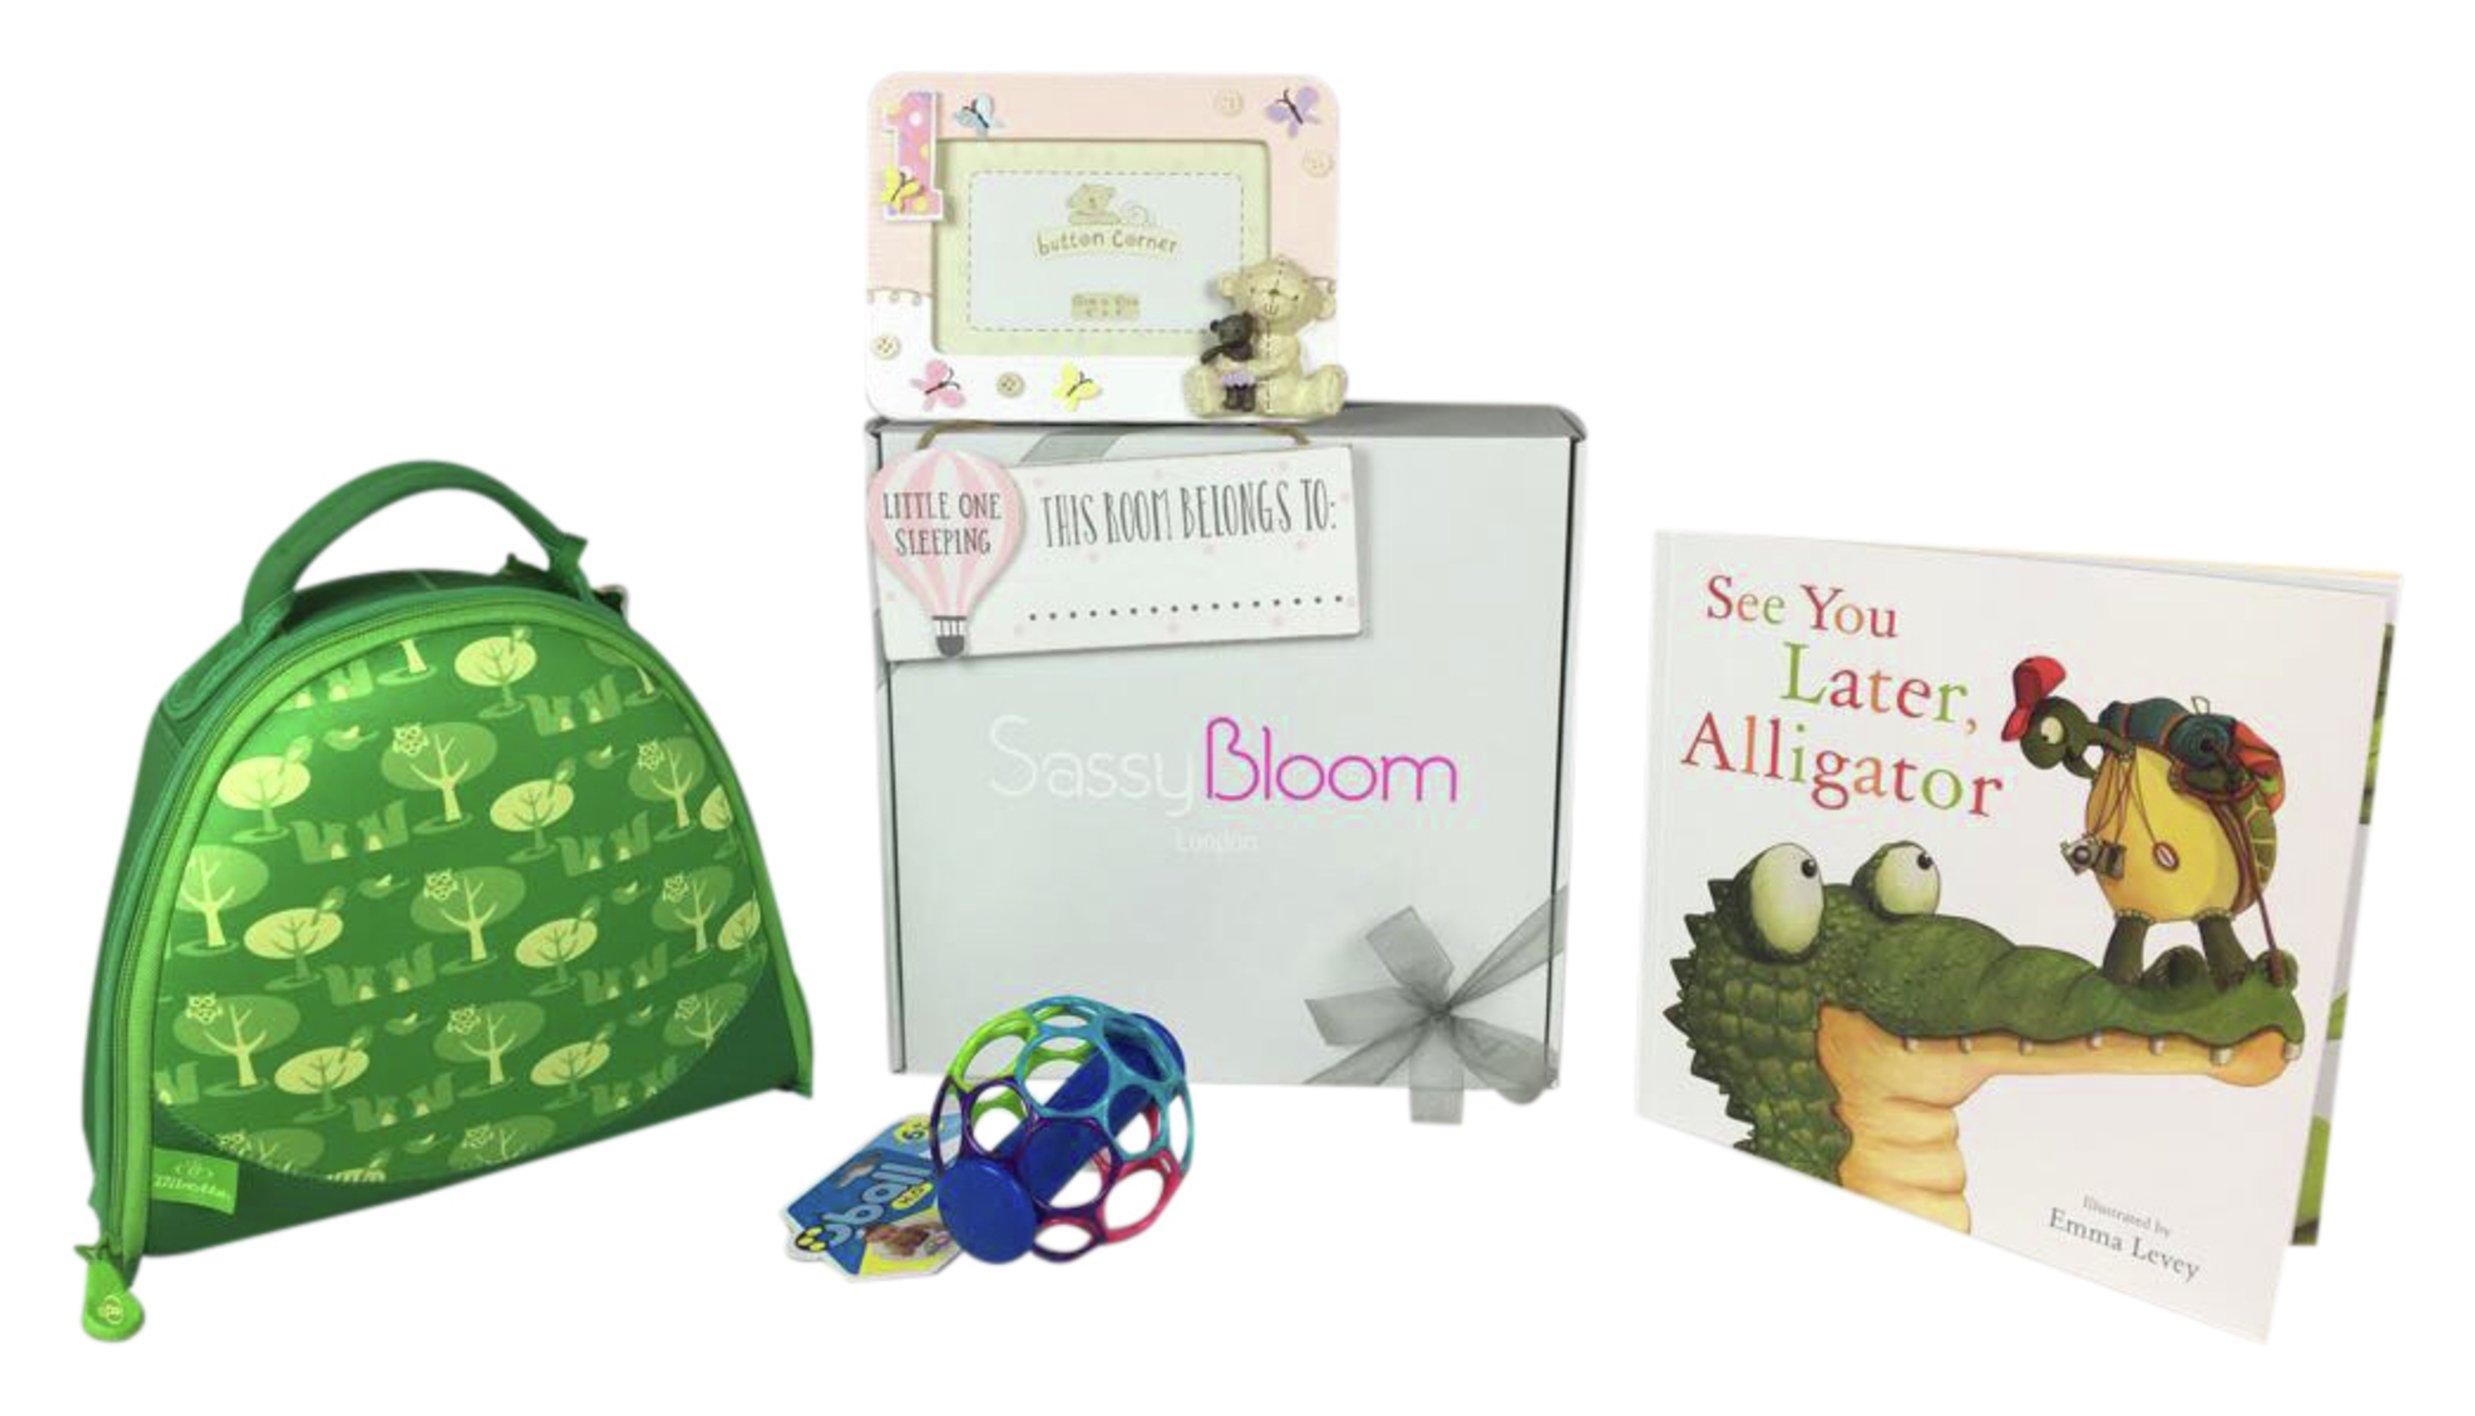 Image of 1st Birthday - Special Edition Girls Sassy Bloom - Box